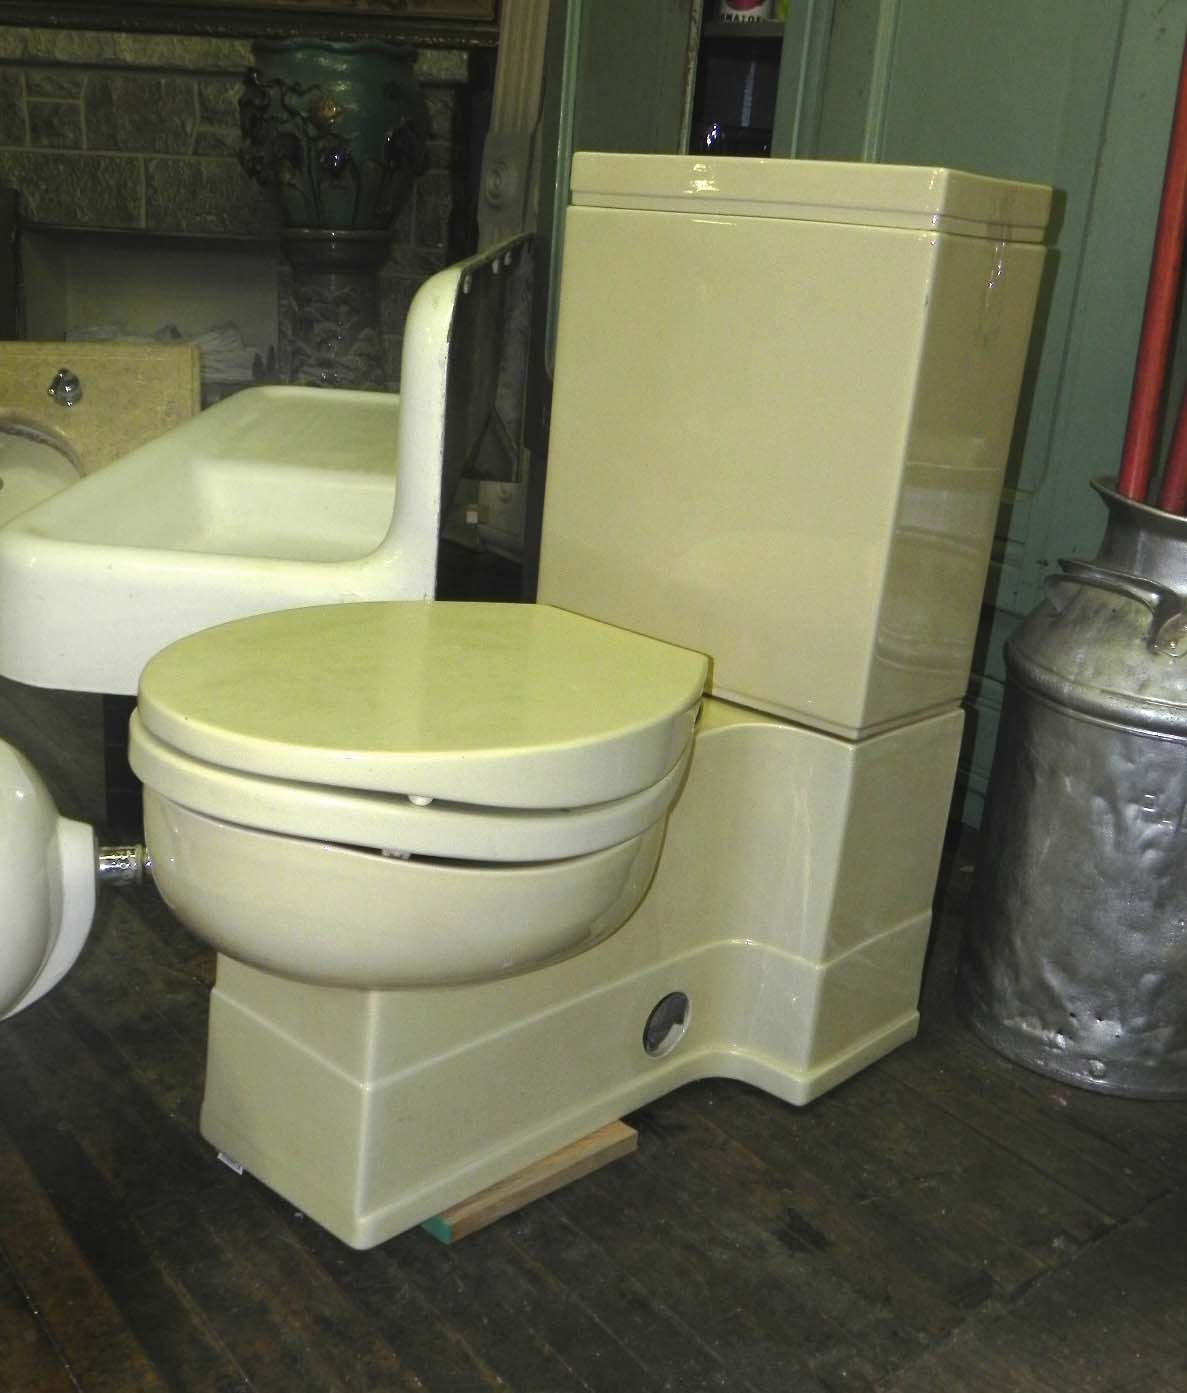 Charming How To Paint A Bathtub Thick Bath Tub Paint Flat Bathtub Refinishers Bath Refinishing Service Youthful Paint Tub Brown Bathtub Repair Contractor